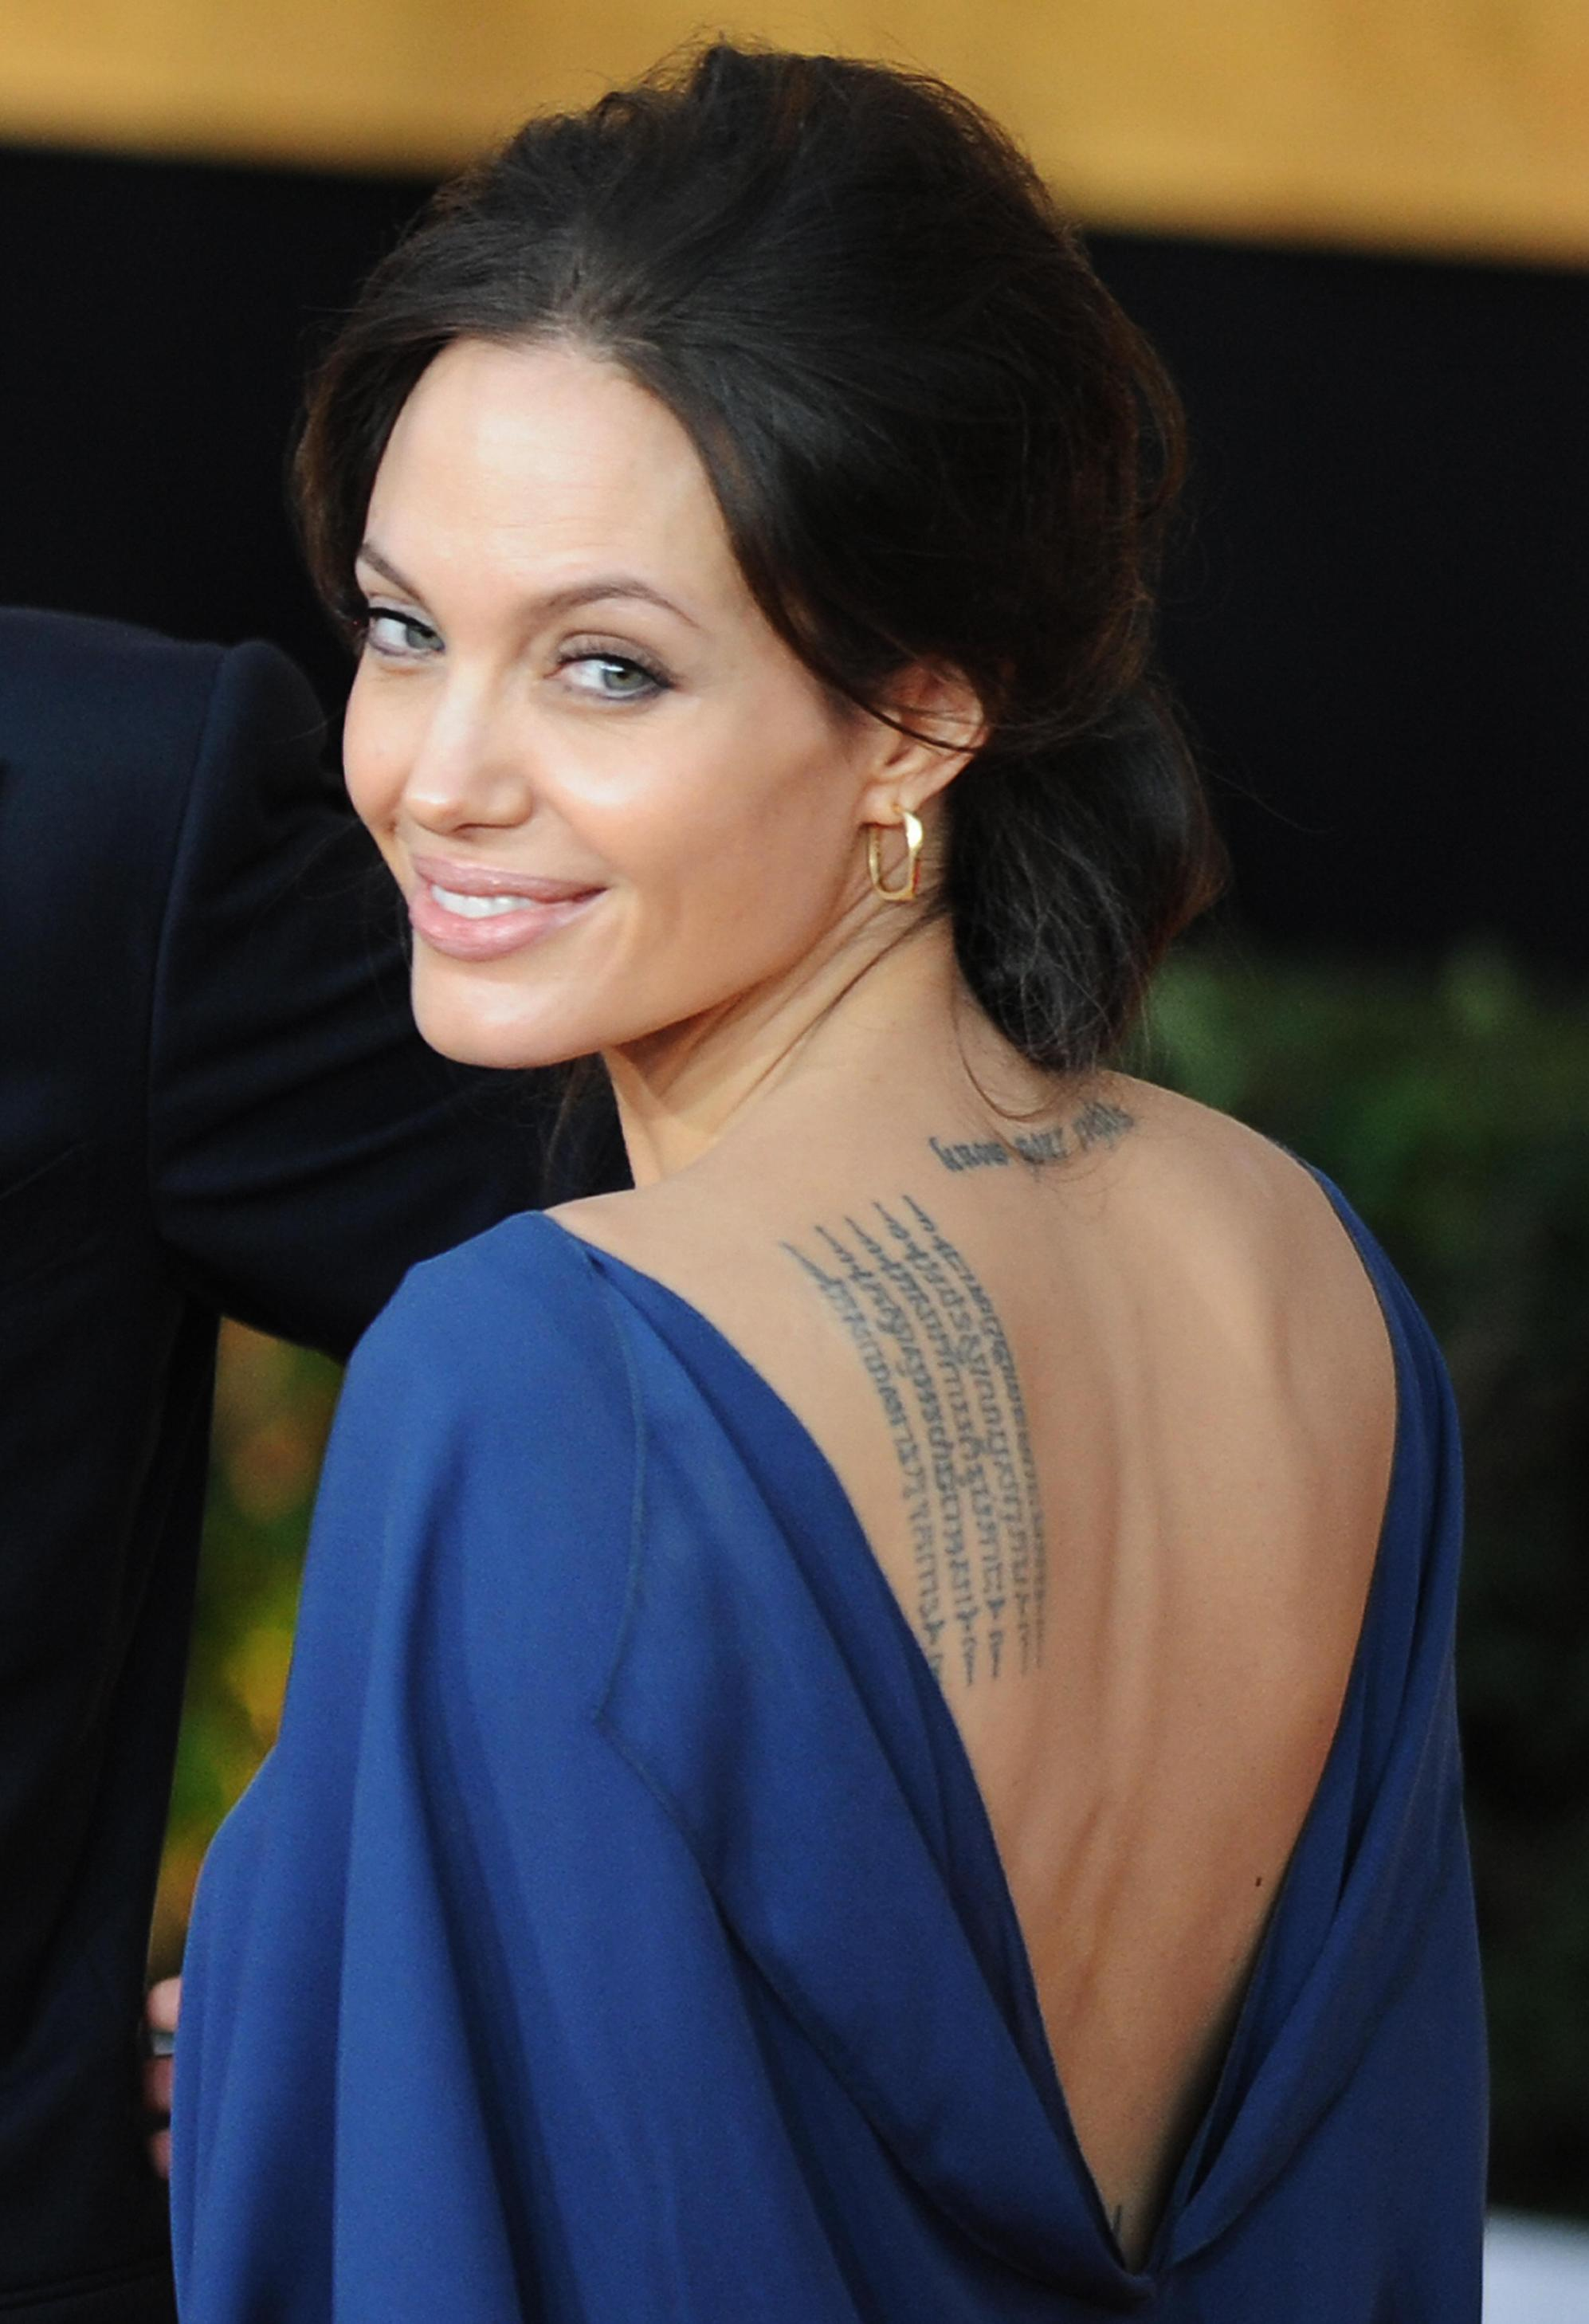 Анджелина Джоли (Angelina Jolie) 3348 фото | ThePlace ... анджелина джоли новости